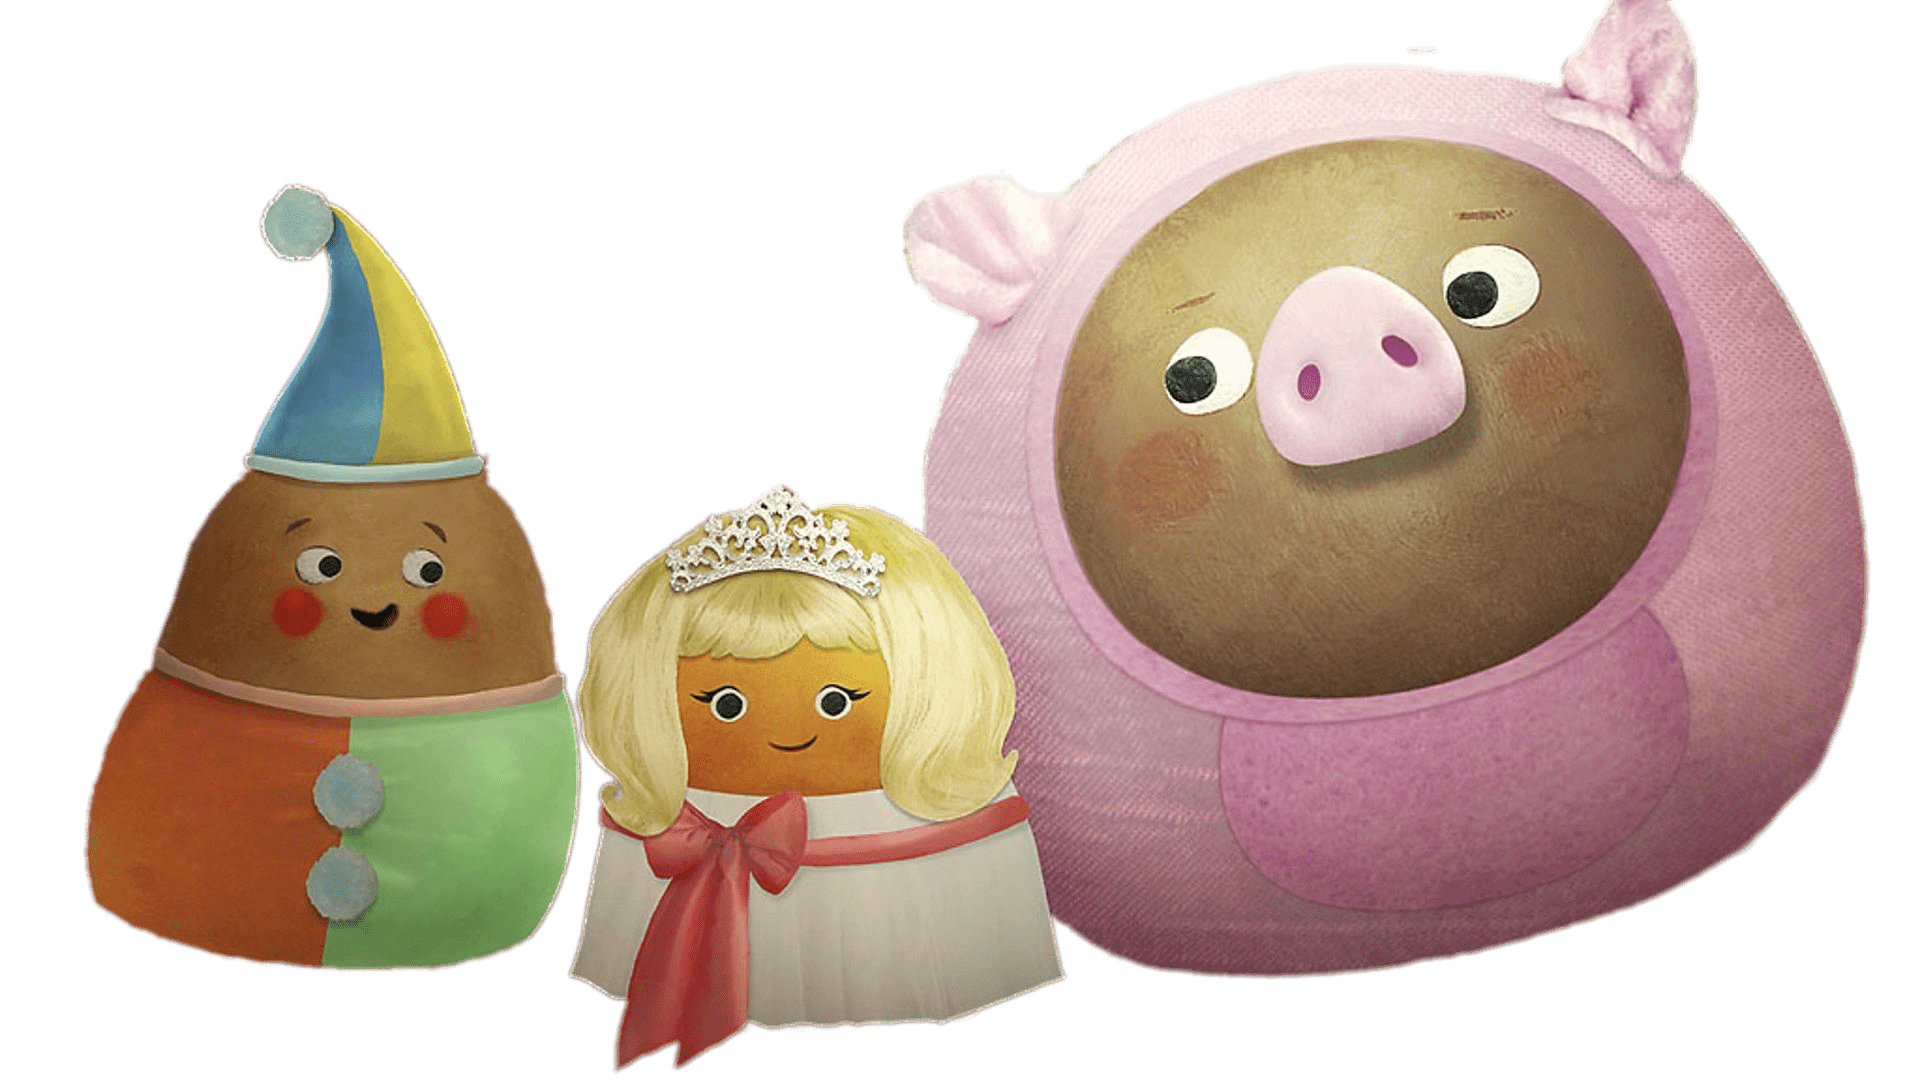 Small potatoes carnival transparent. Potato clipart smile